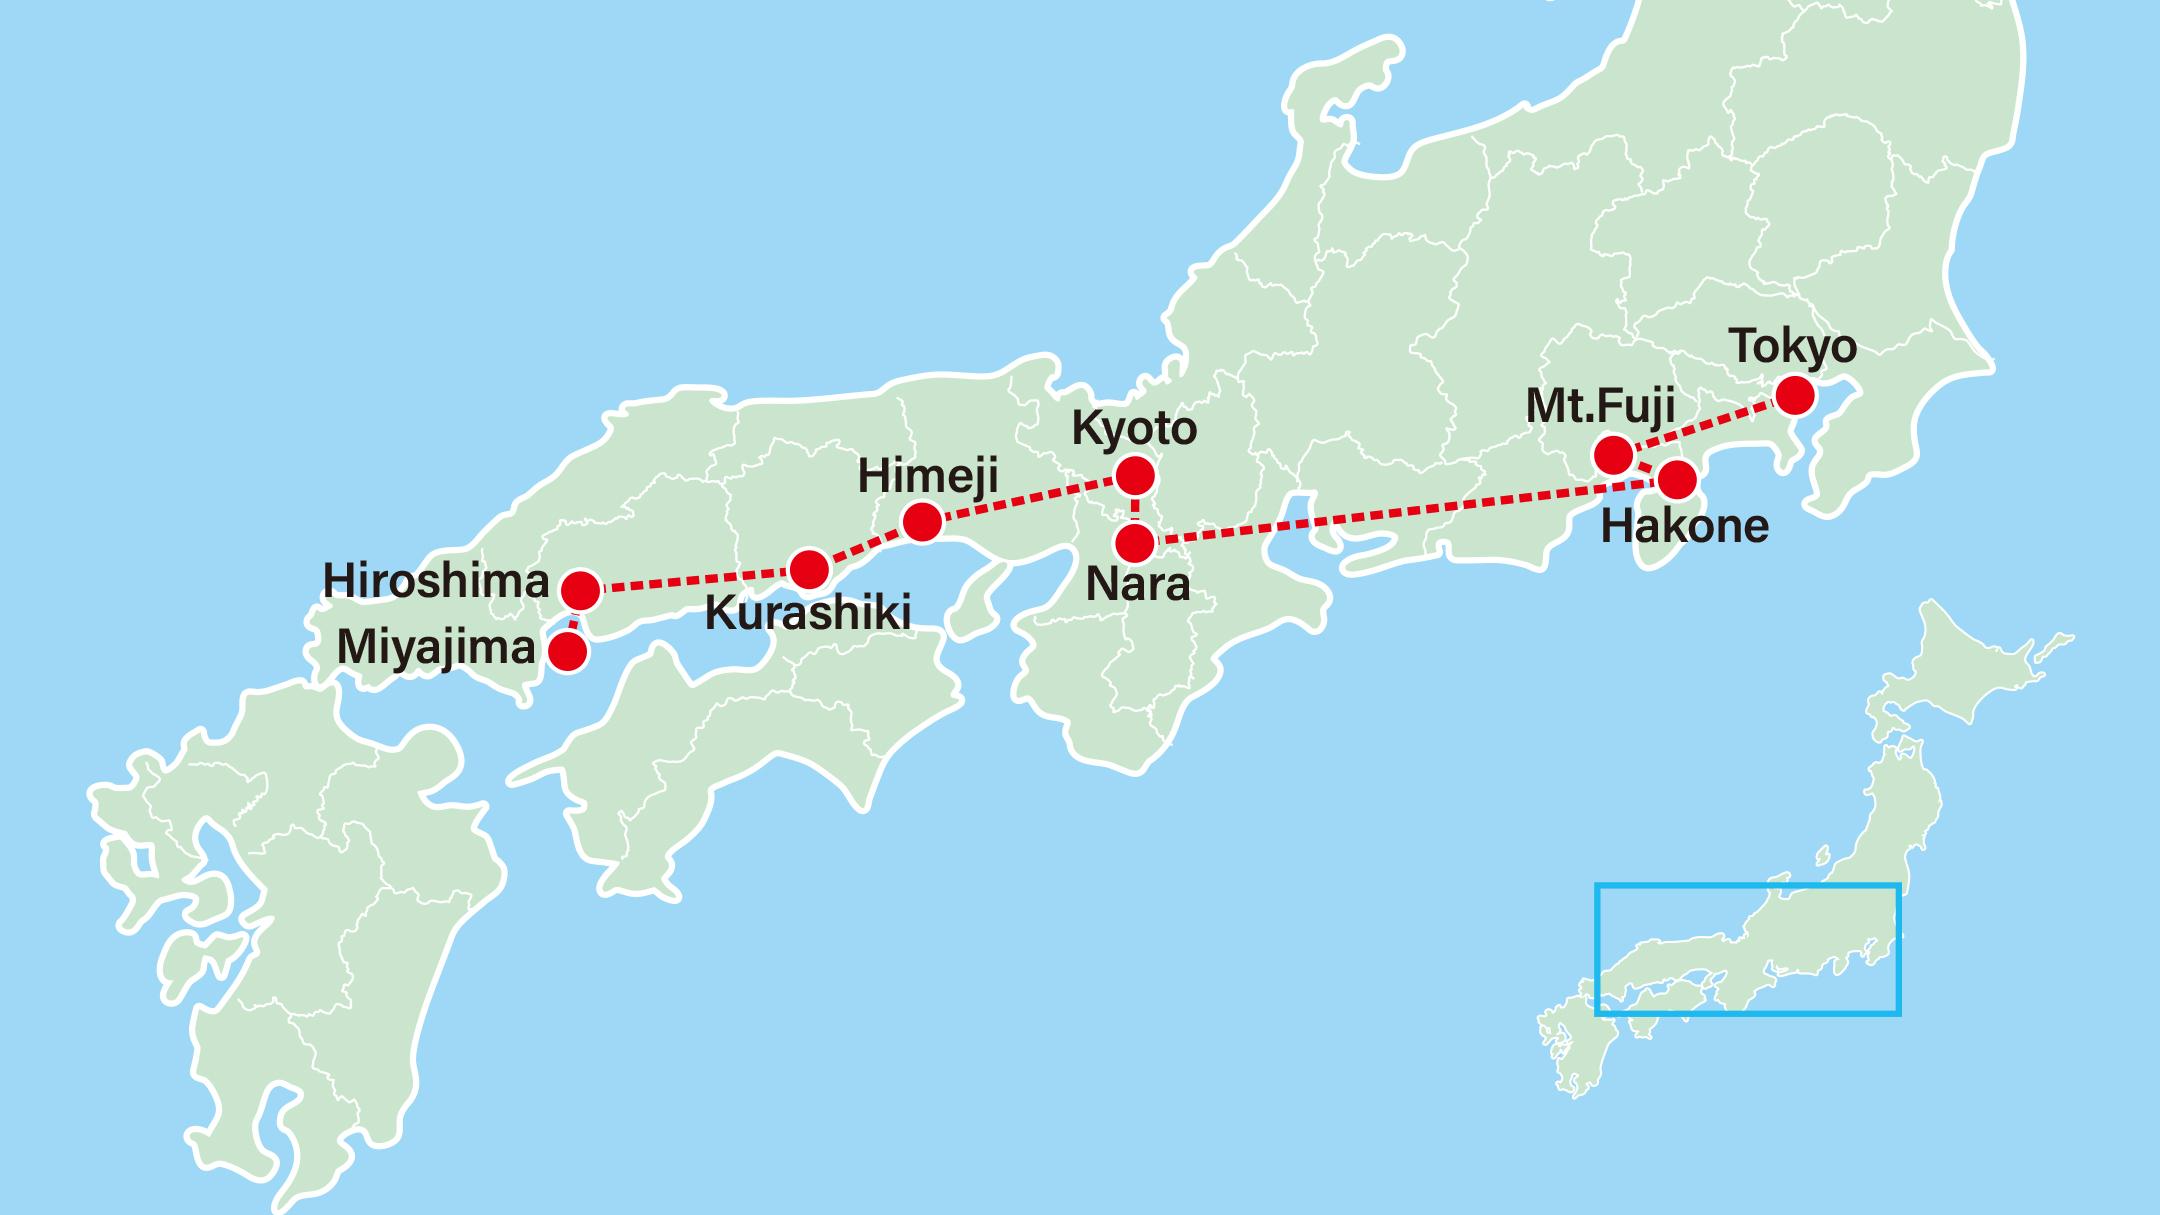 Best of Japan Gion Festival 10 Day Vacation-Gion Festival-Himeji-Kurashiki-Hiroshima-Miyajima-Kyoto-Nara-Hakone-Tokyo